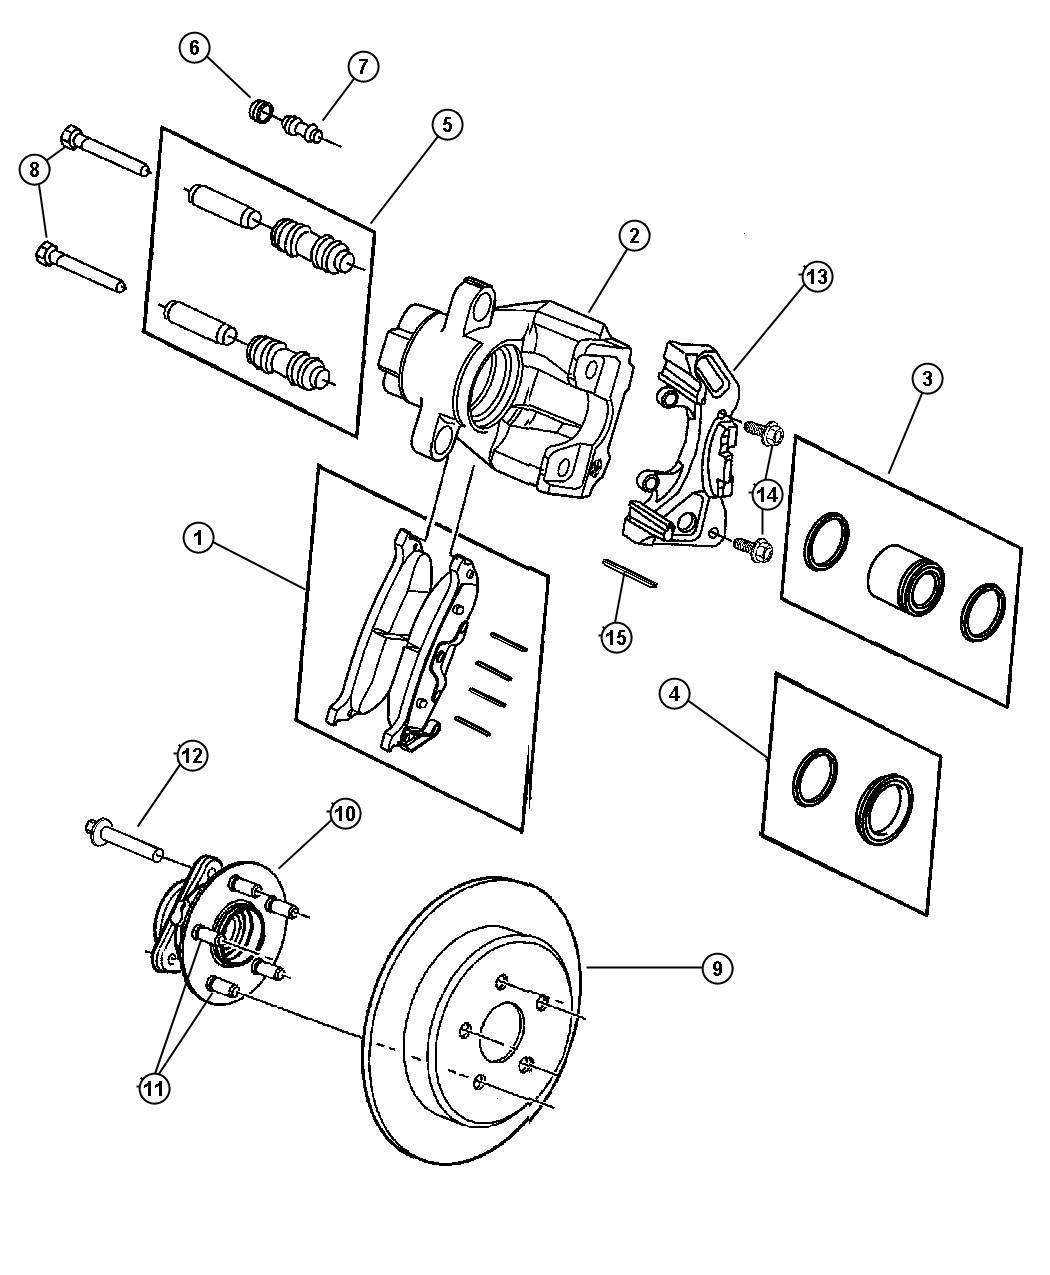 Chrysler Pacifica Rotor Brake Brakes Suspension